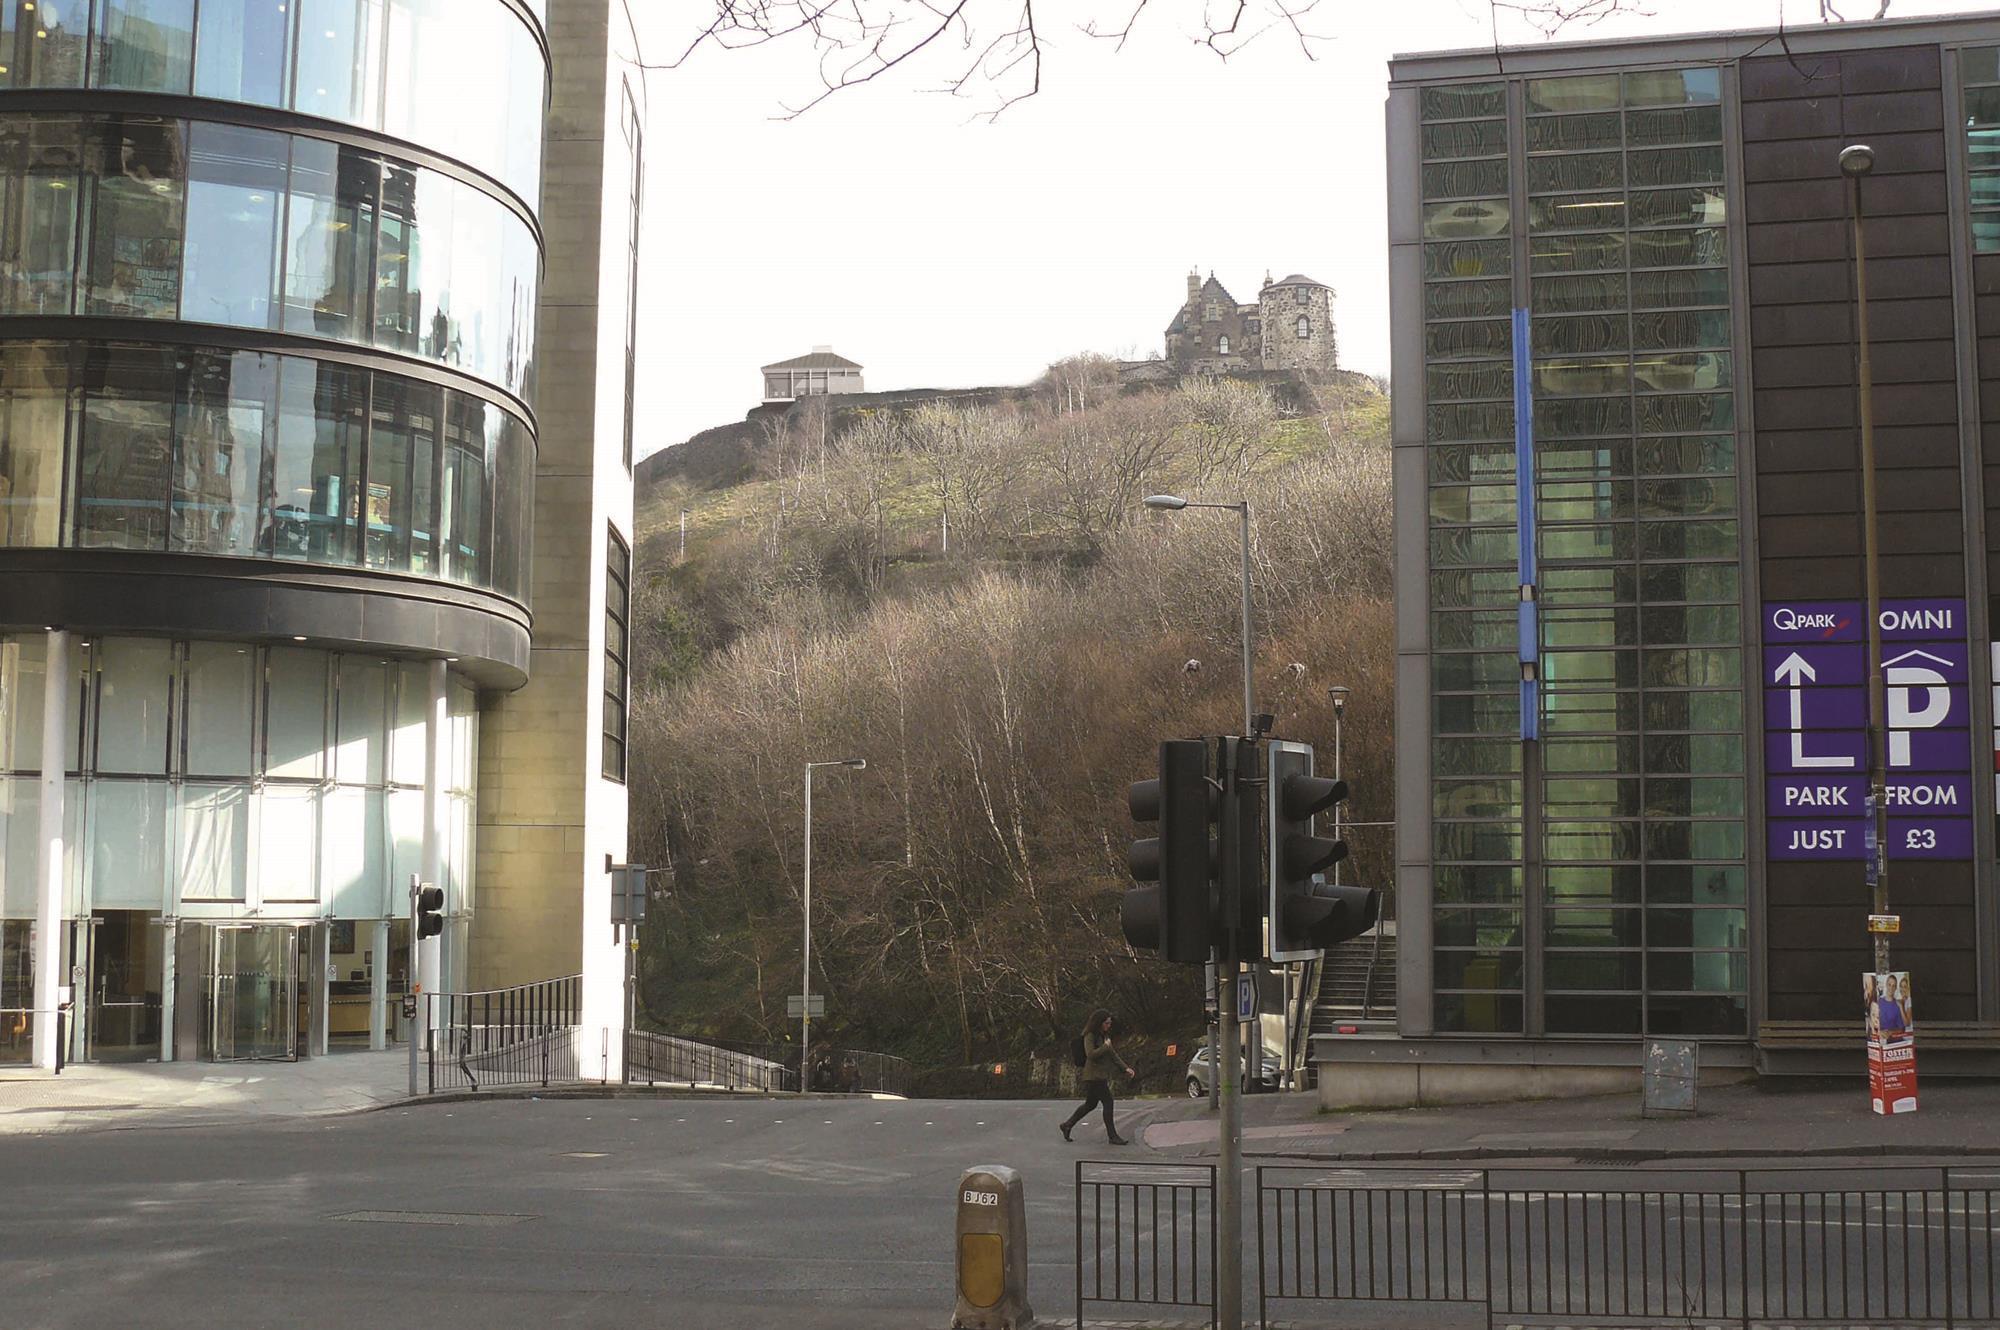 Malcolm Fraser Scheme To Save Edinburgh Landmark News